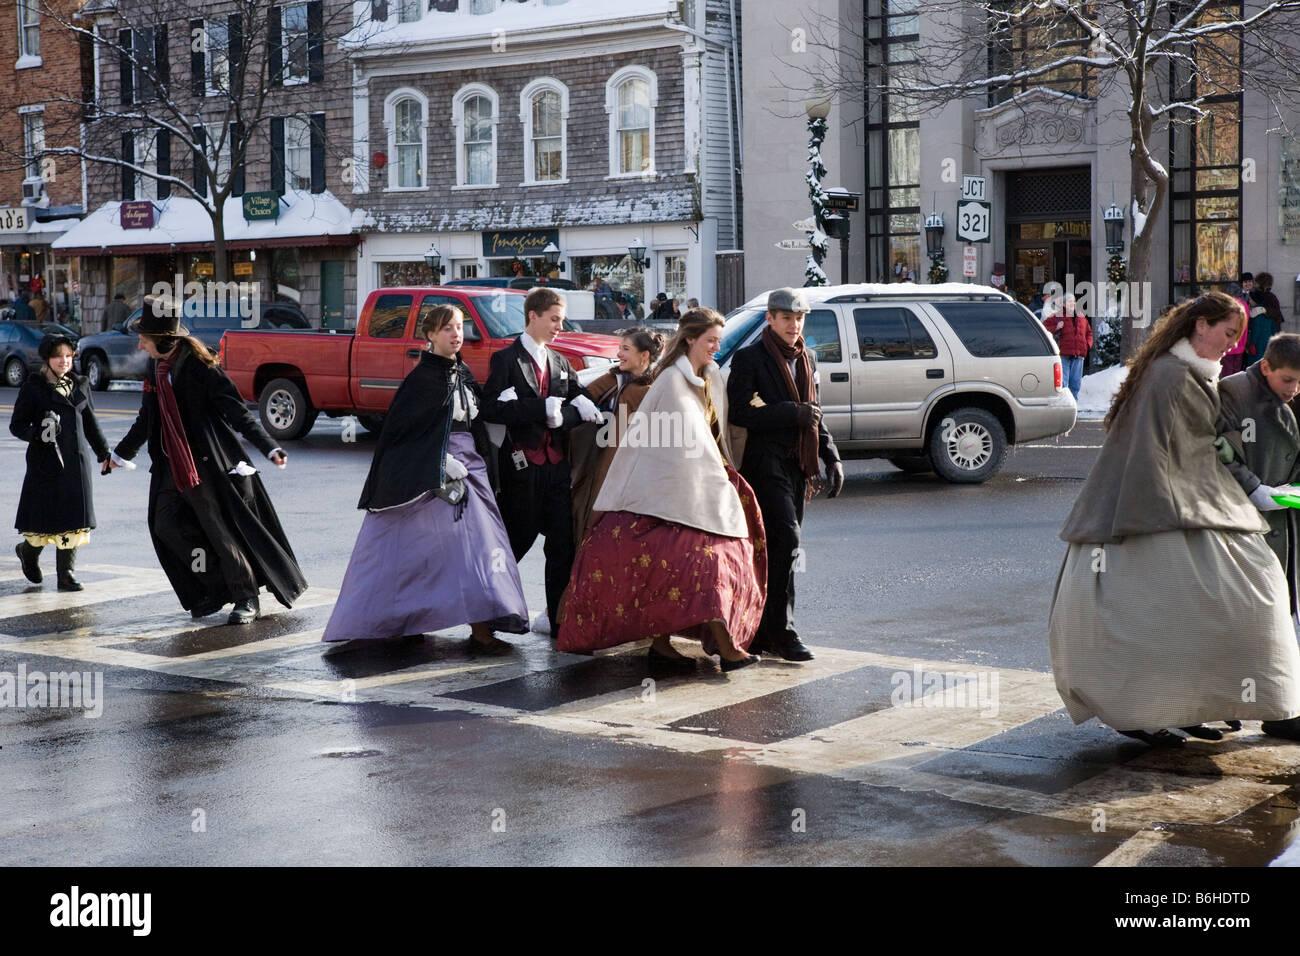 Dickens Christmas Skaneateles 2019 Annual Dickens Christmas Skaneateles New York State Finger Lakes